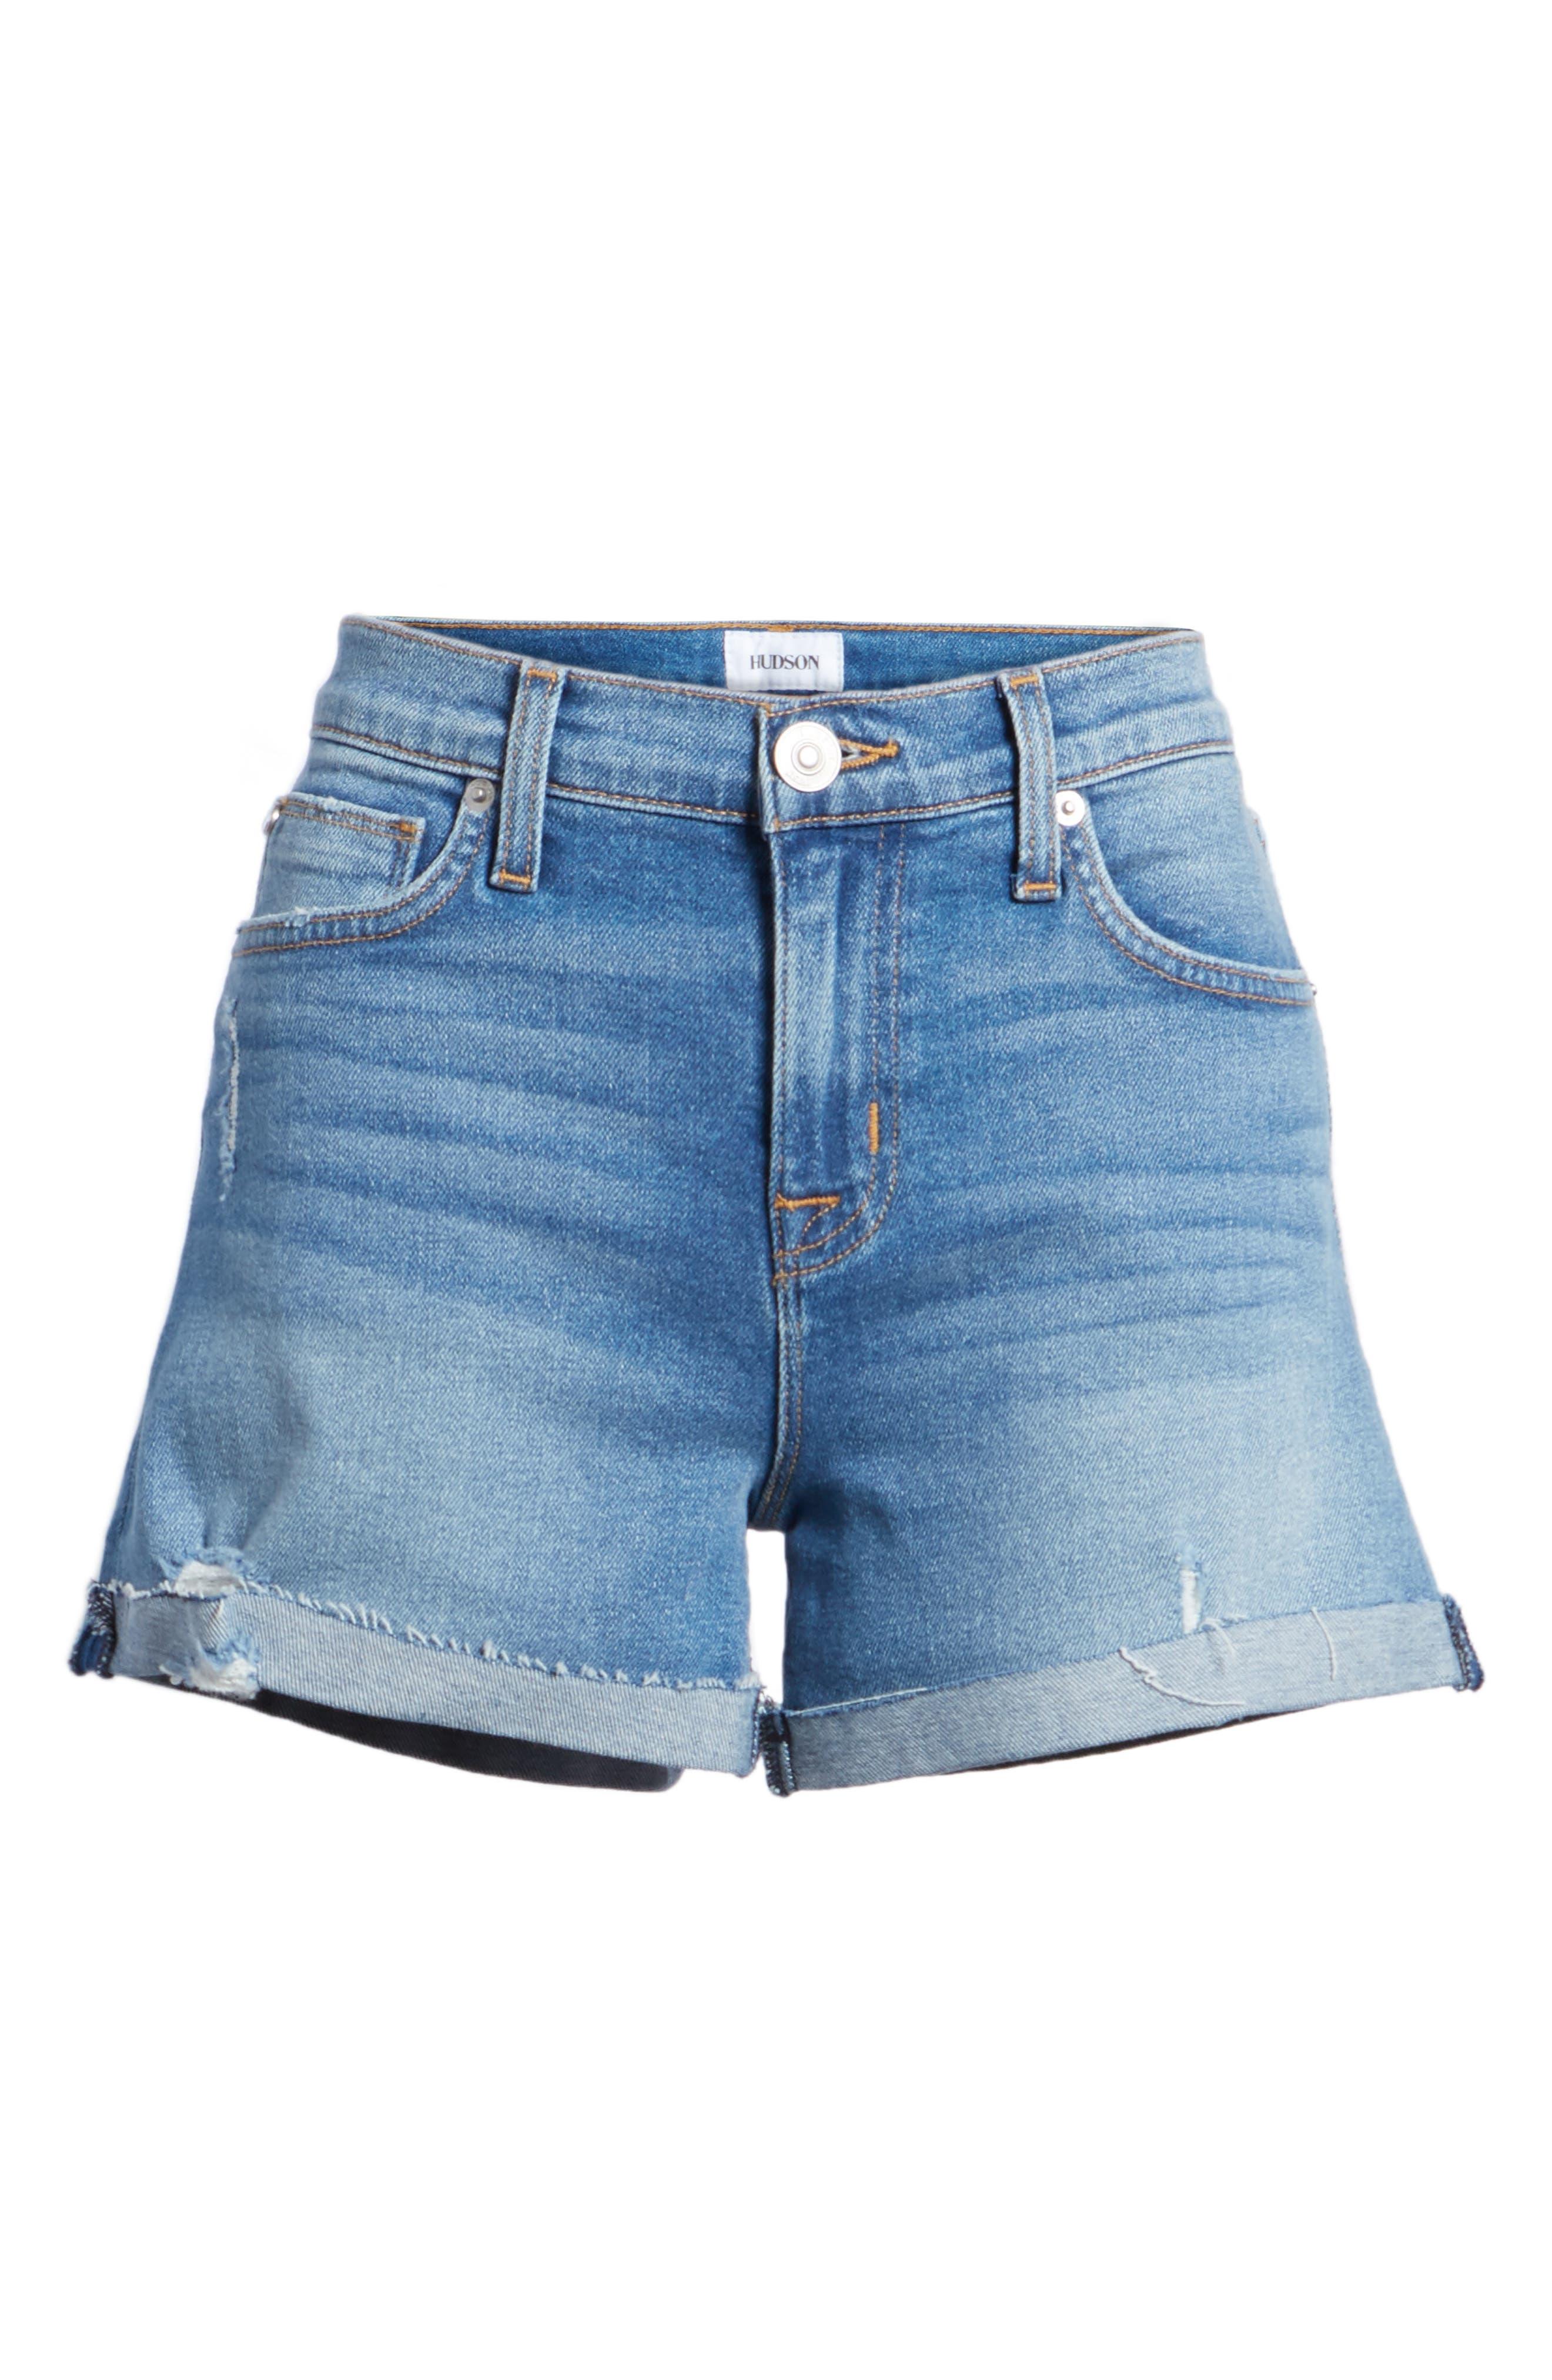 Valeri Cuff Denim Shorts,                             Alternate thumbnail 6, color,                             Proxy